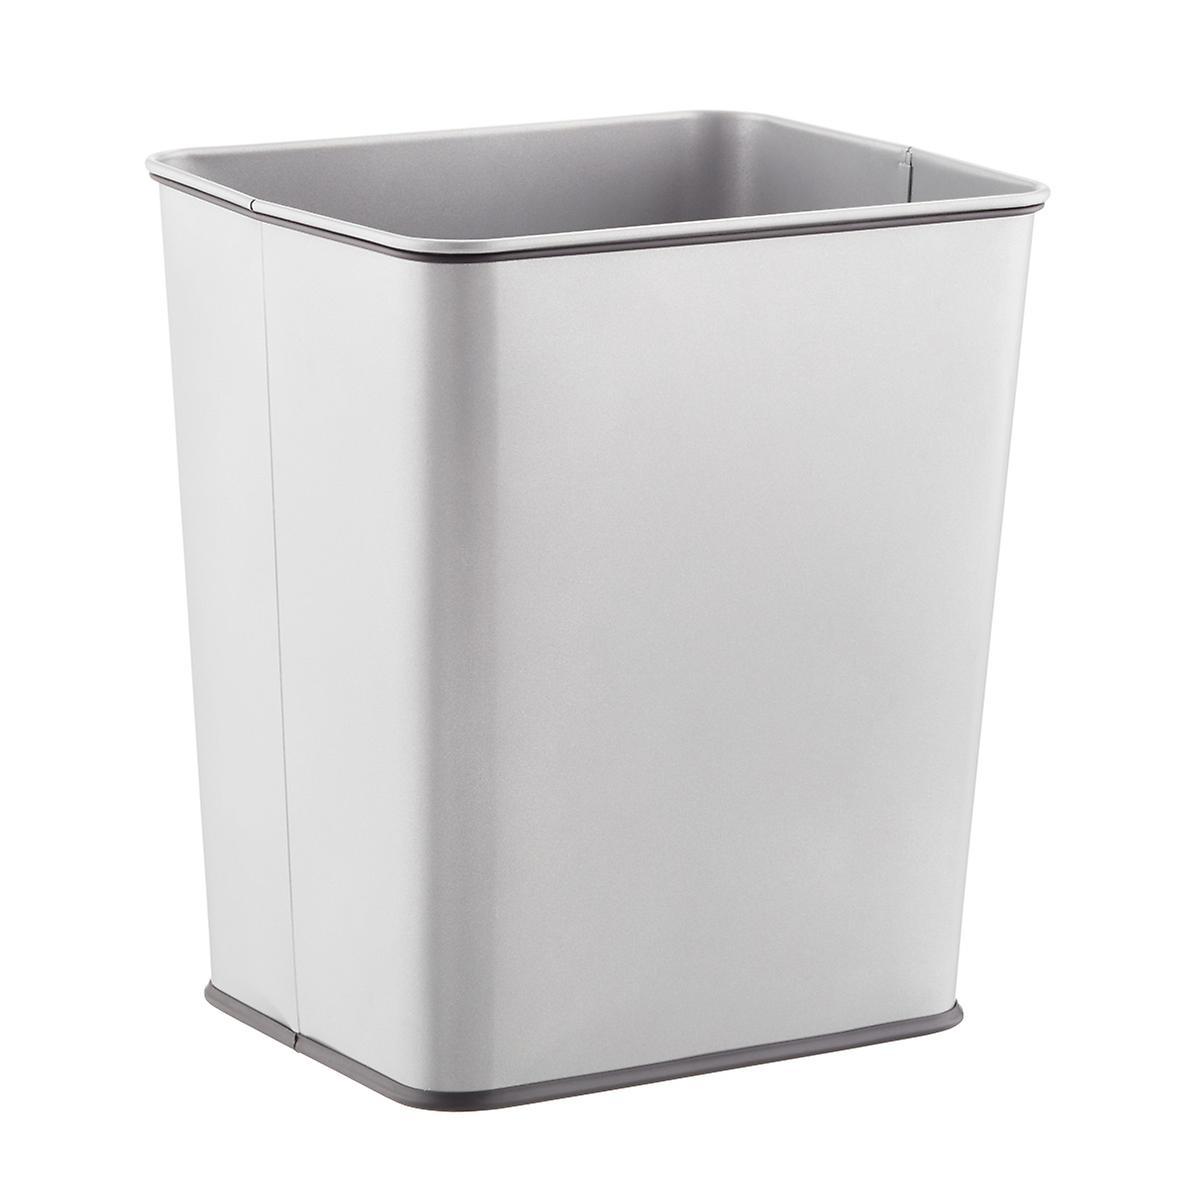 Rectangular Undercounter Trash Can